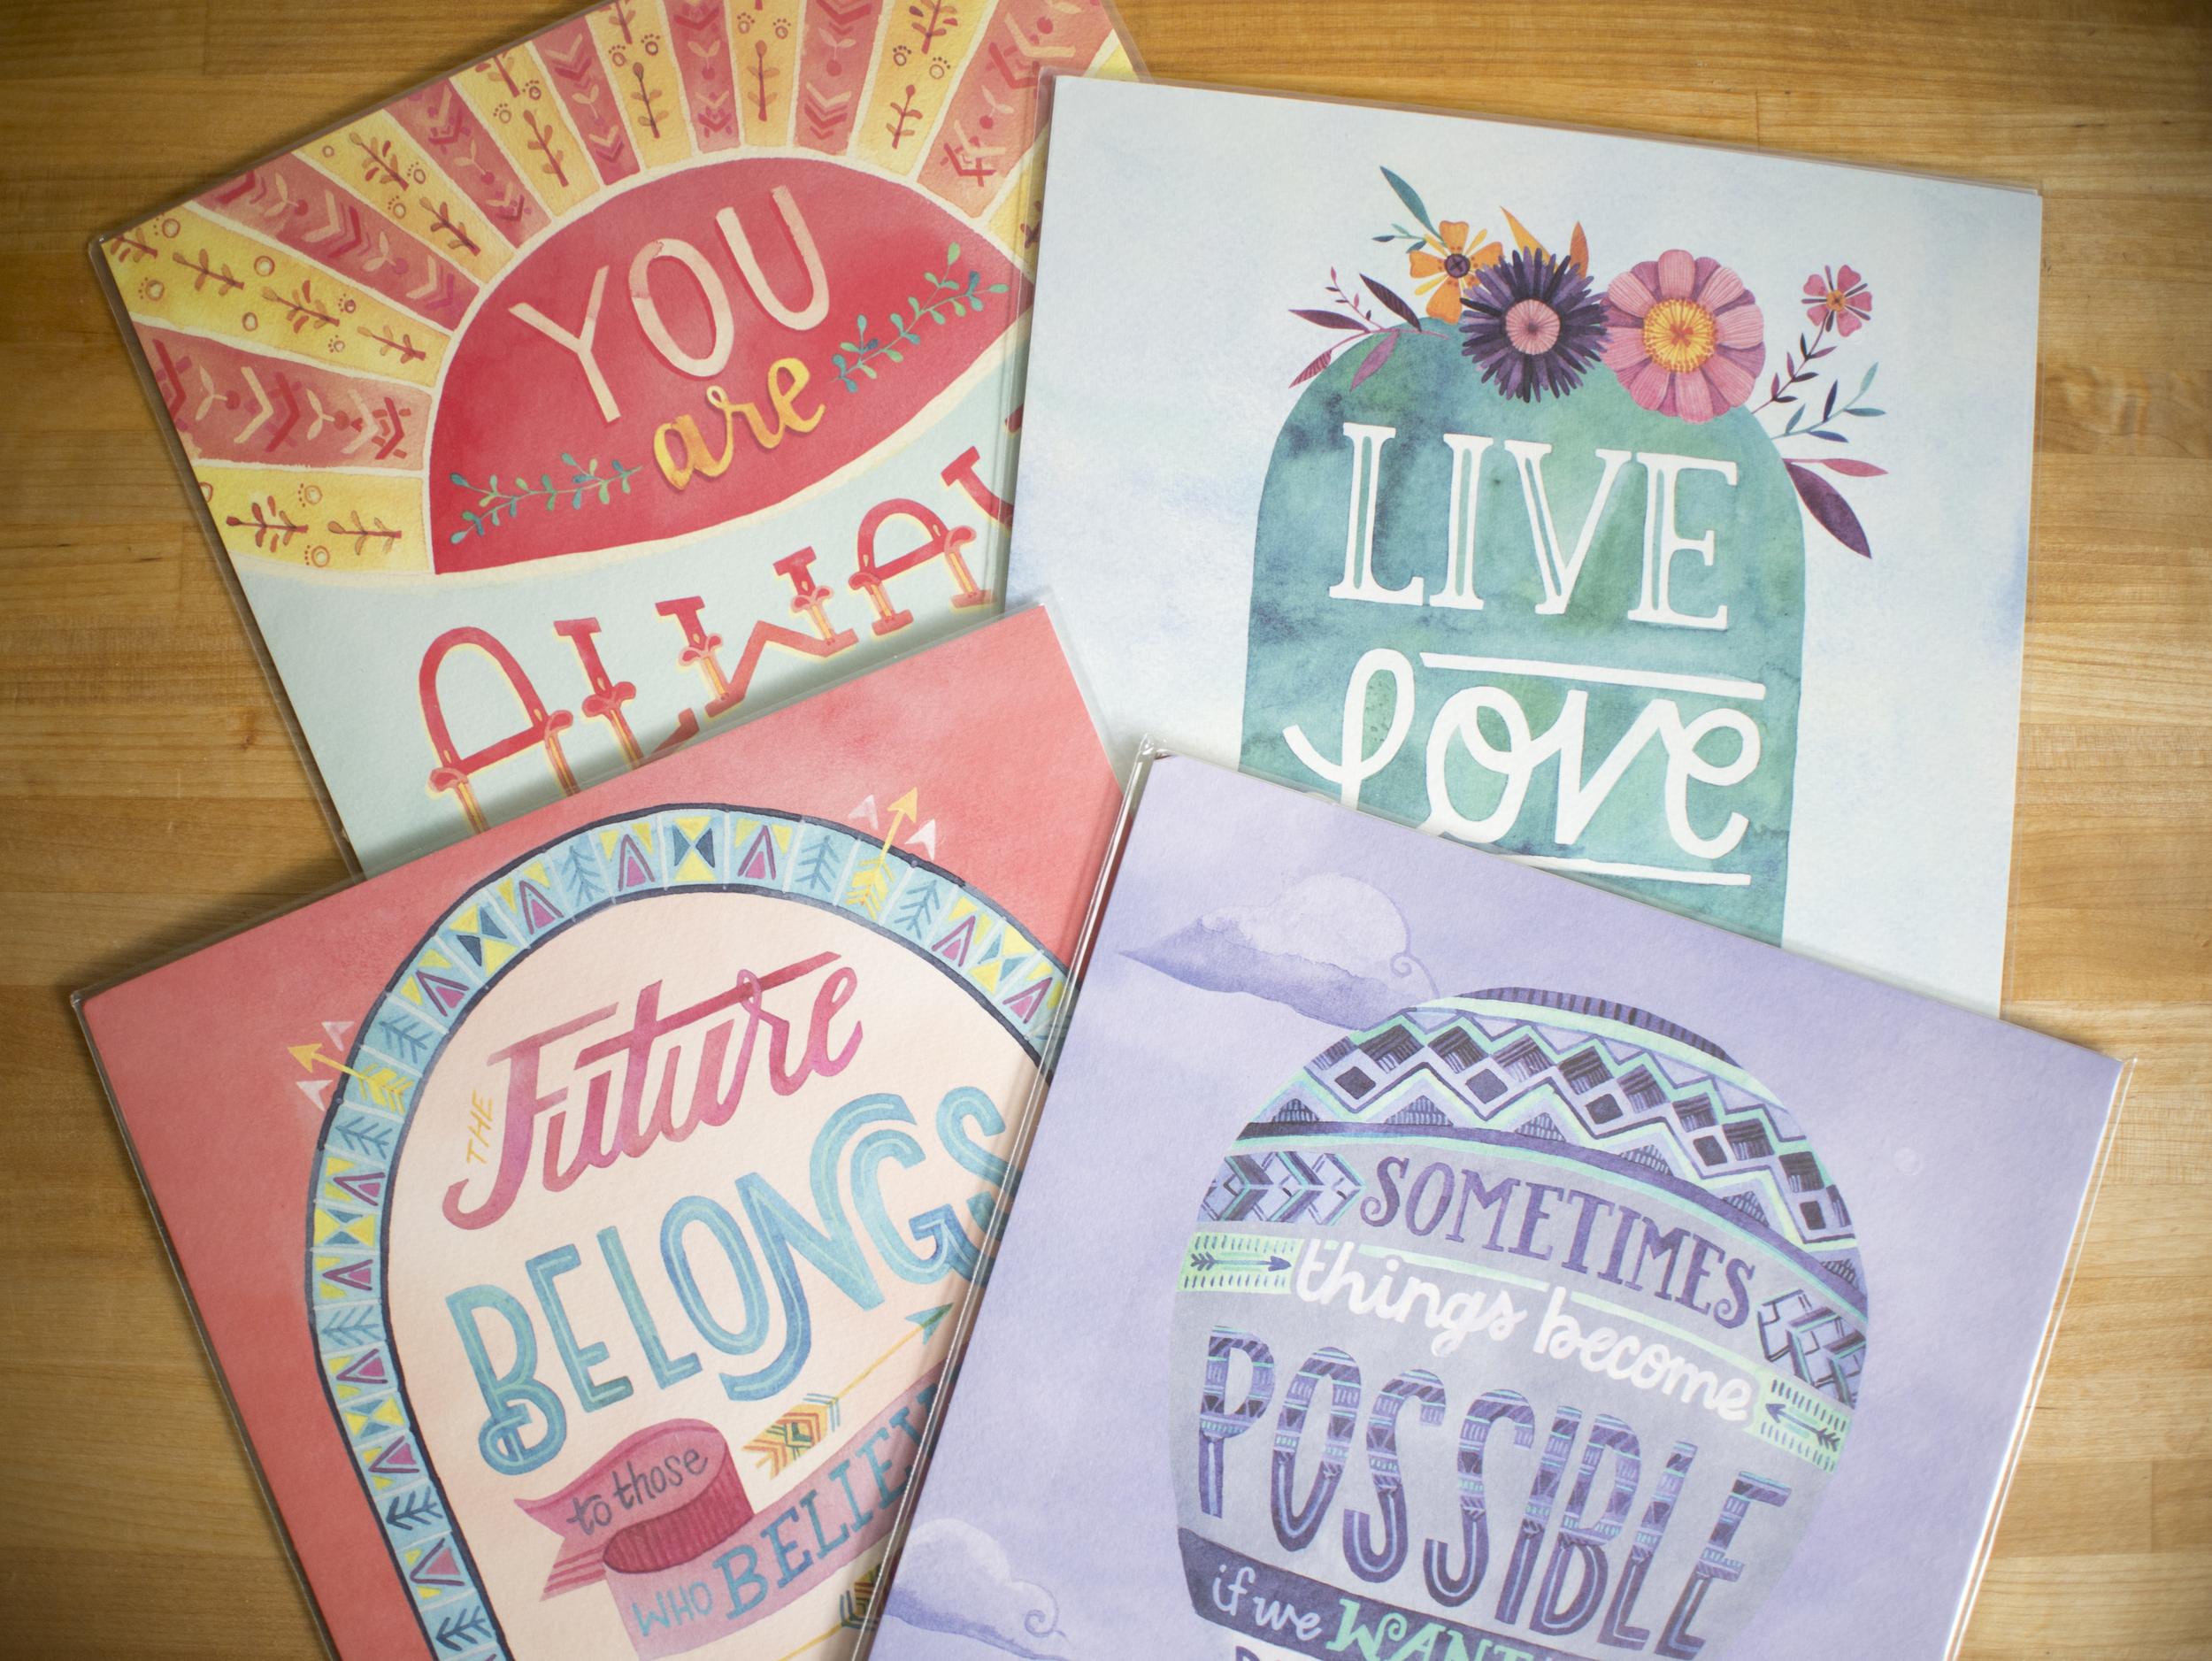 Studio Oh! art prints by Becca Cahan